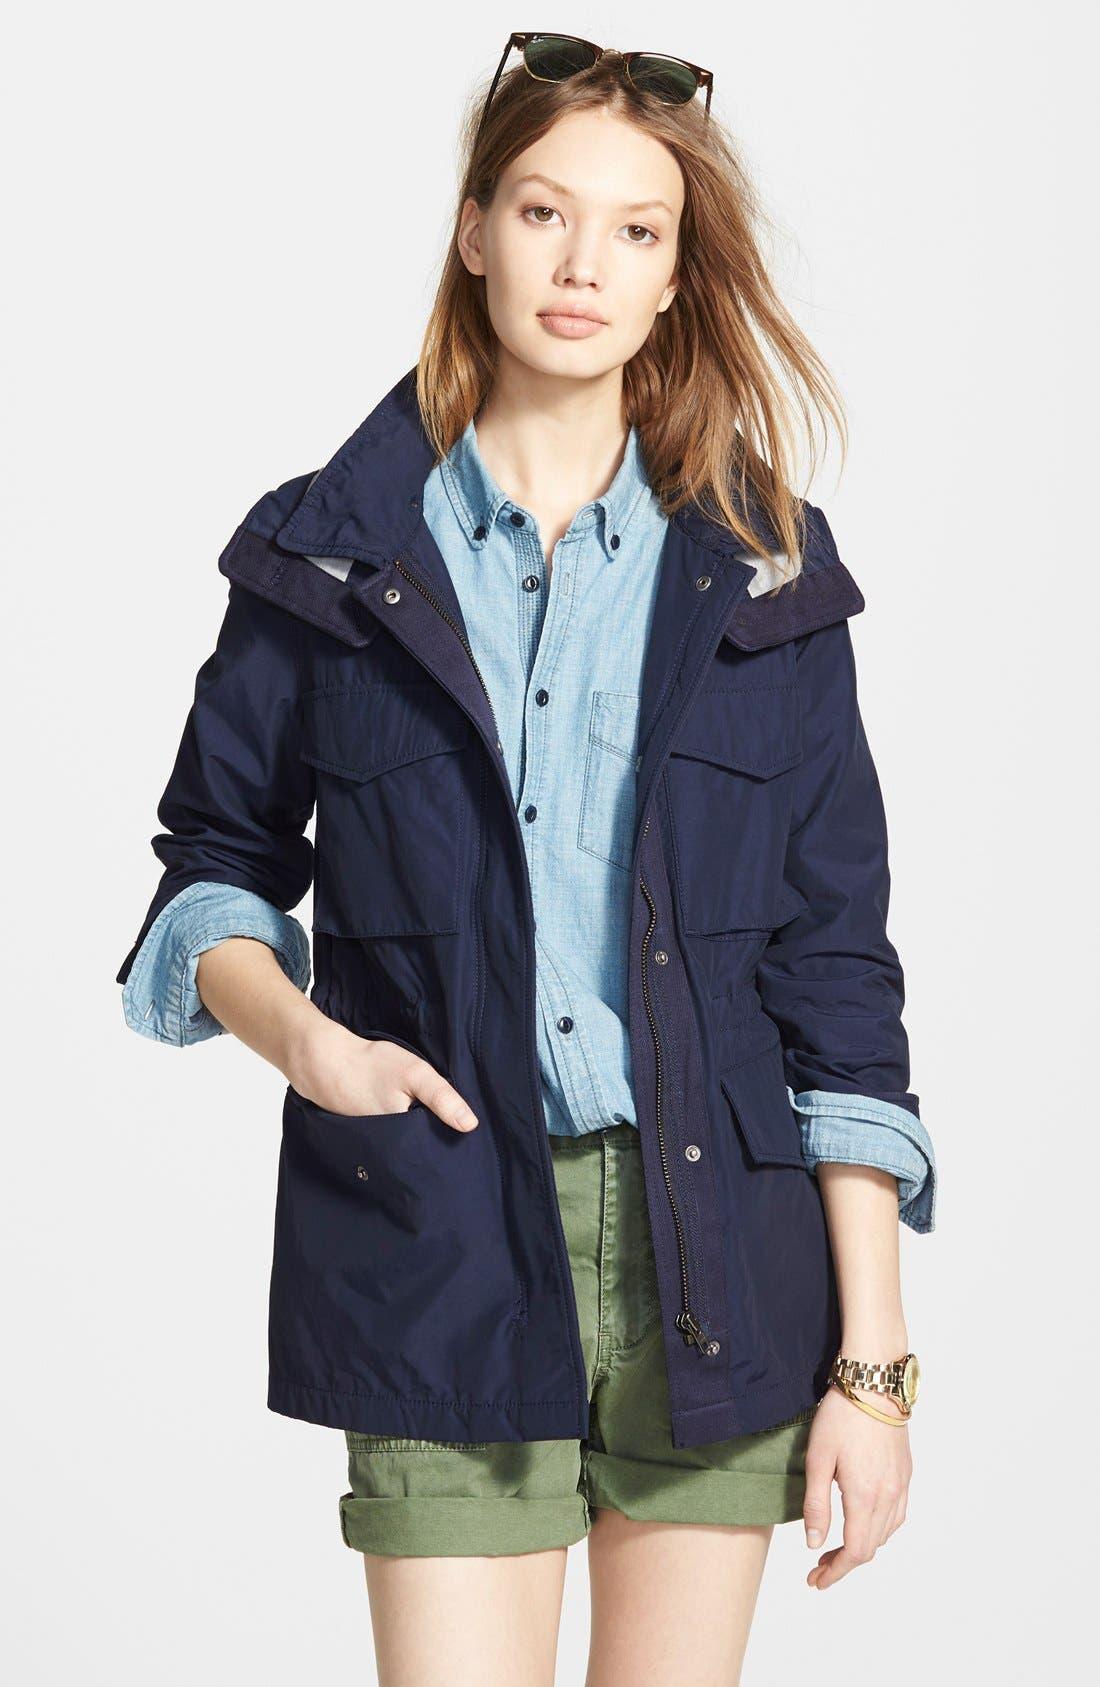 Alternate Image 1 Selected - Madewell 'Fieldwalk' Hooded Jacket